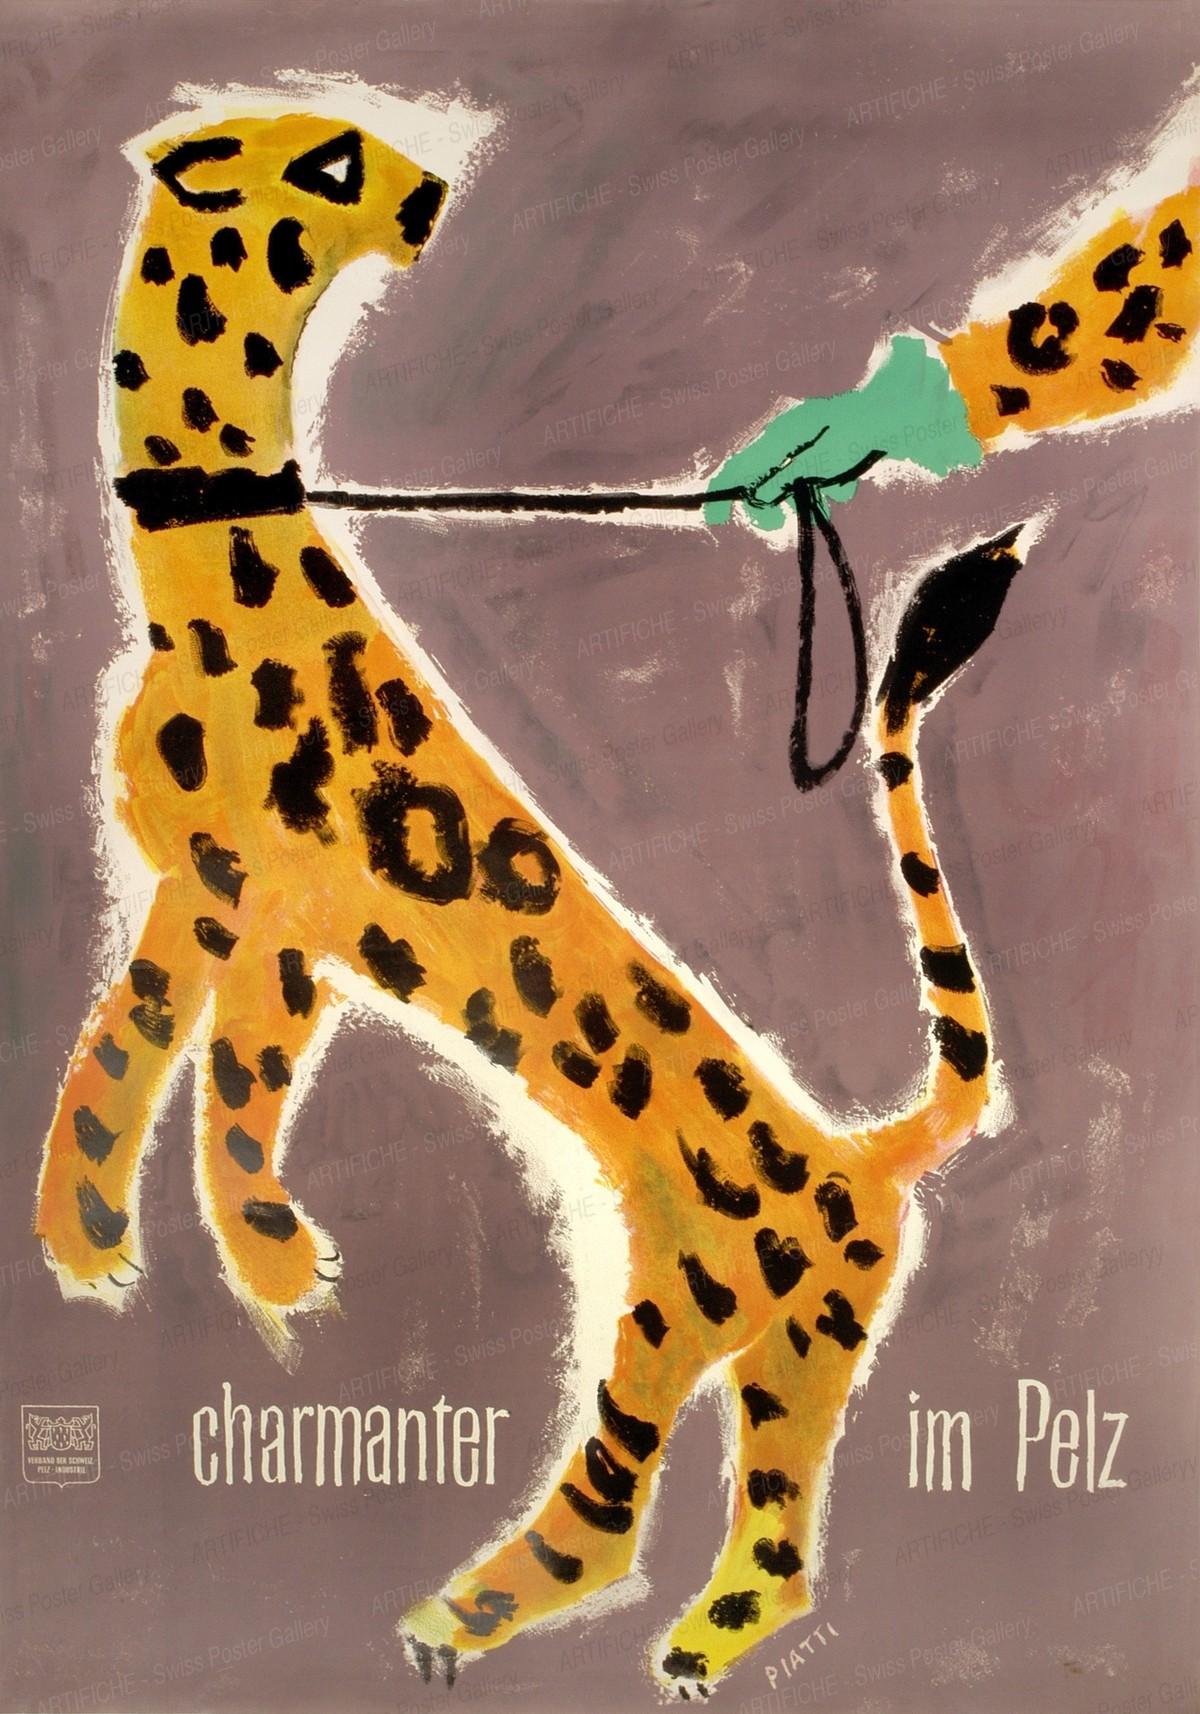 charmanter im Pelz, Celestino Piatti